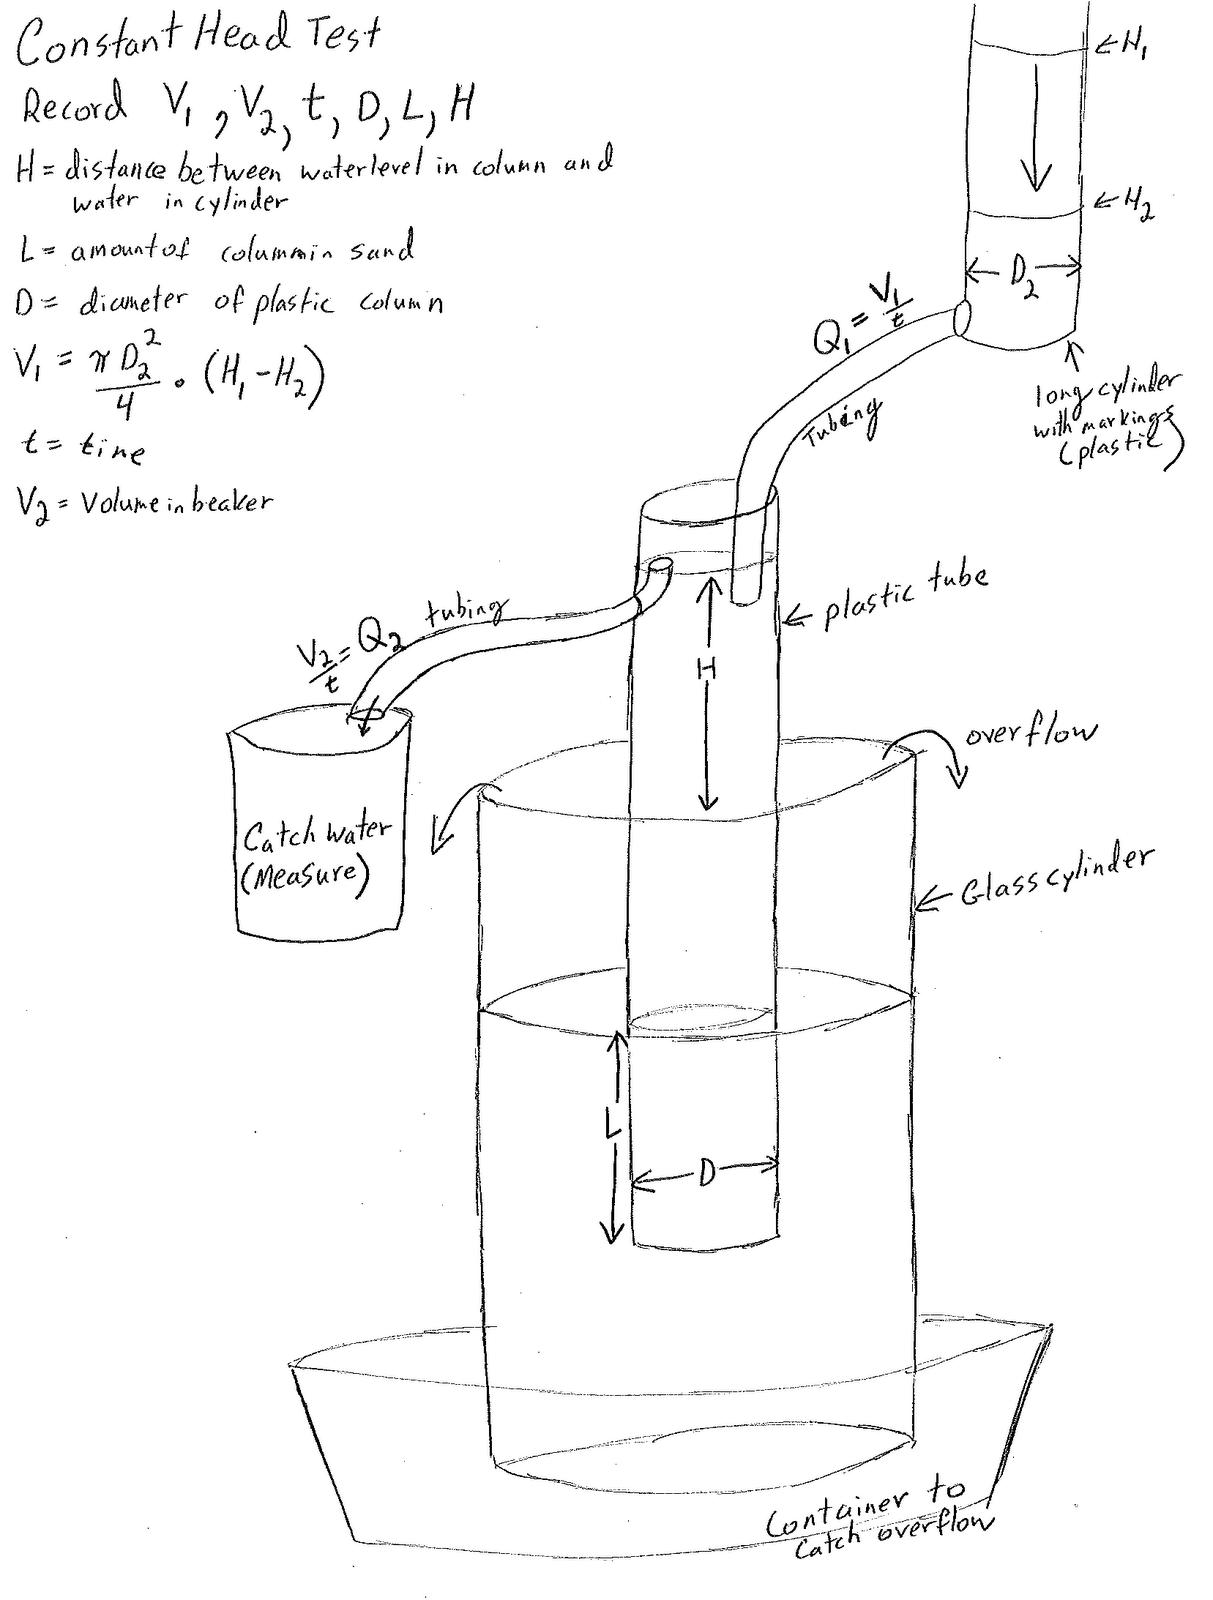 sau hydraulic conductivity 2012 the constant head test [ 1213 x 1600 Pixel ]